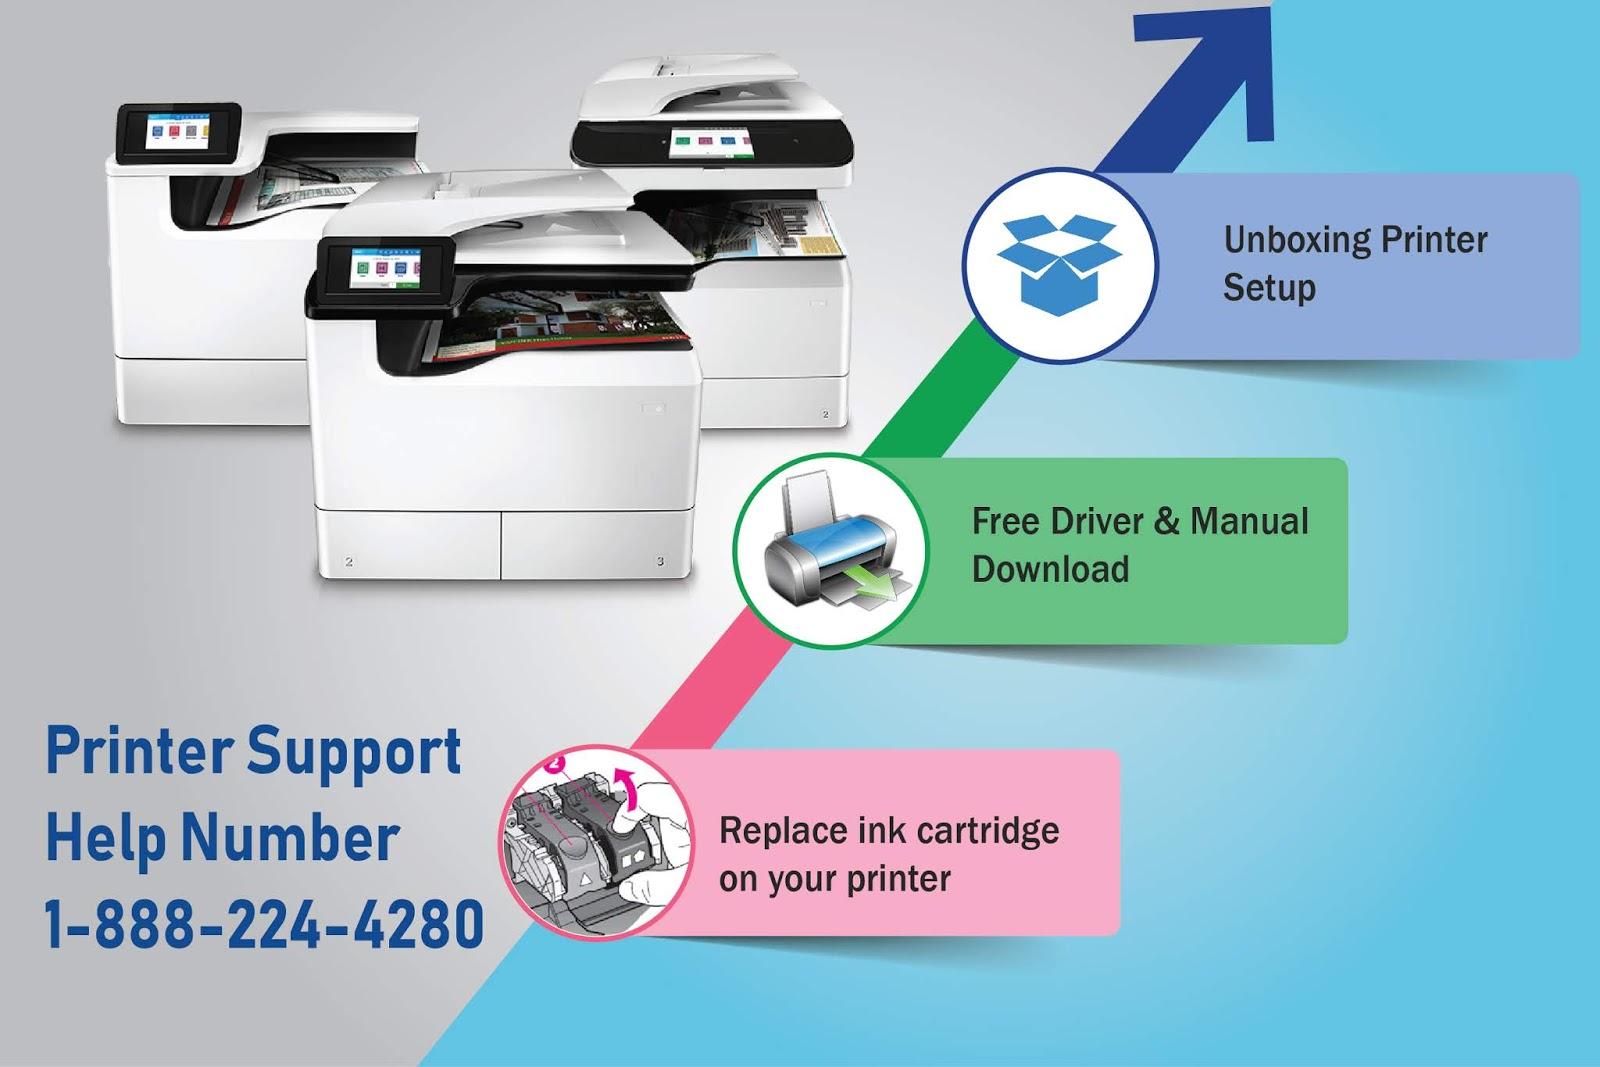 HP Printer: How to fix HP printer not printing?